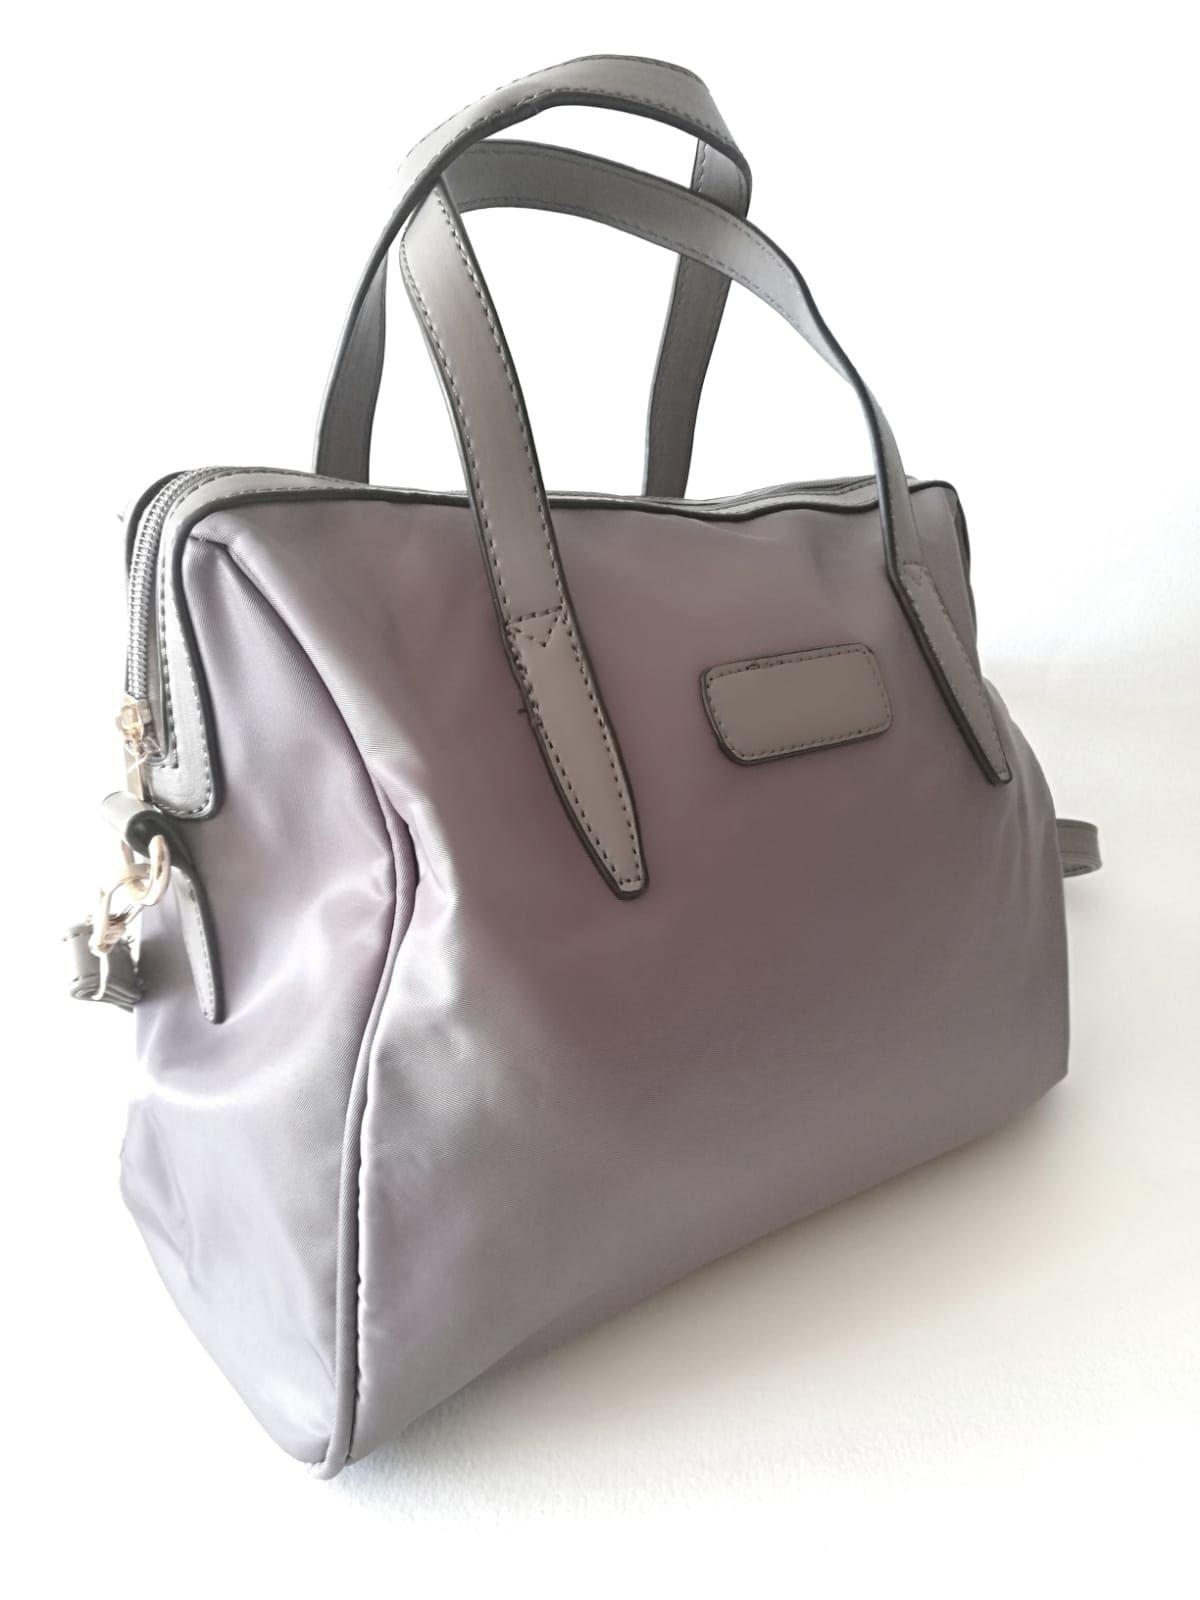 01ba10748 Bolso gris tela impermeableasas cortas y asa larga tendencia complementos